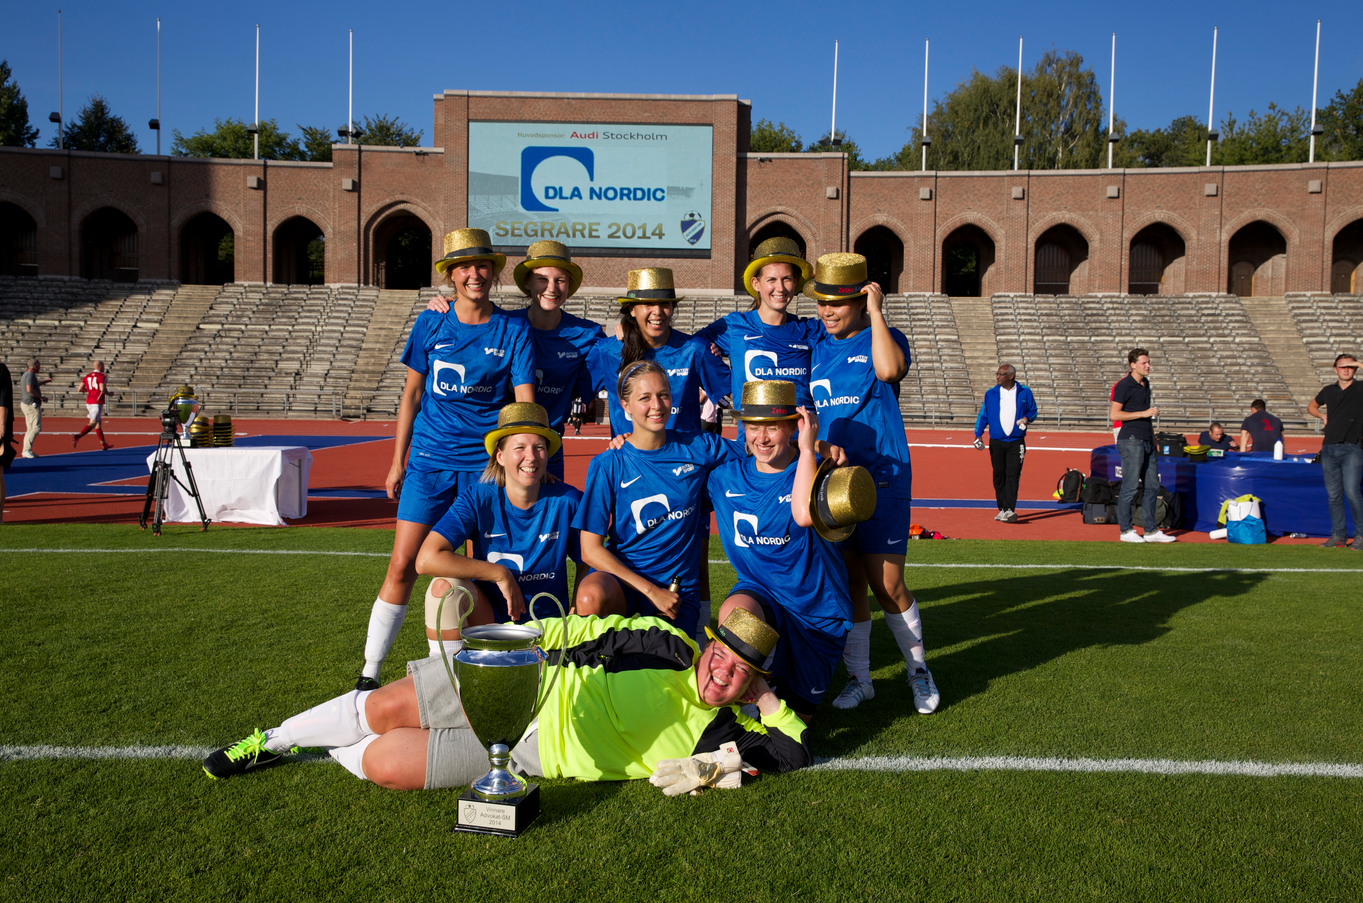 DLA Nordic 2014